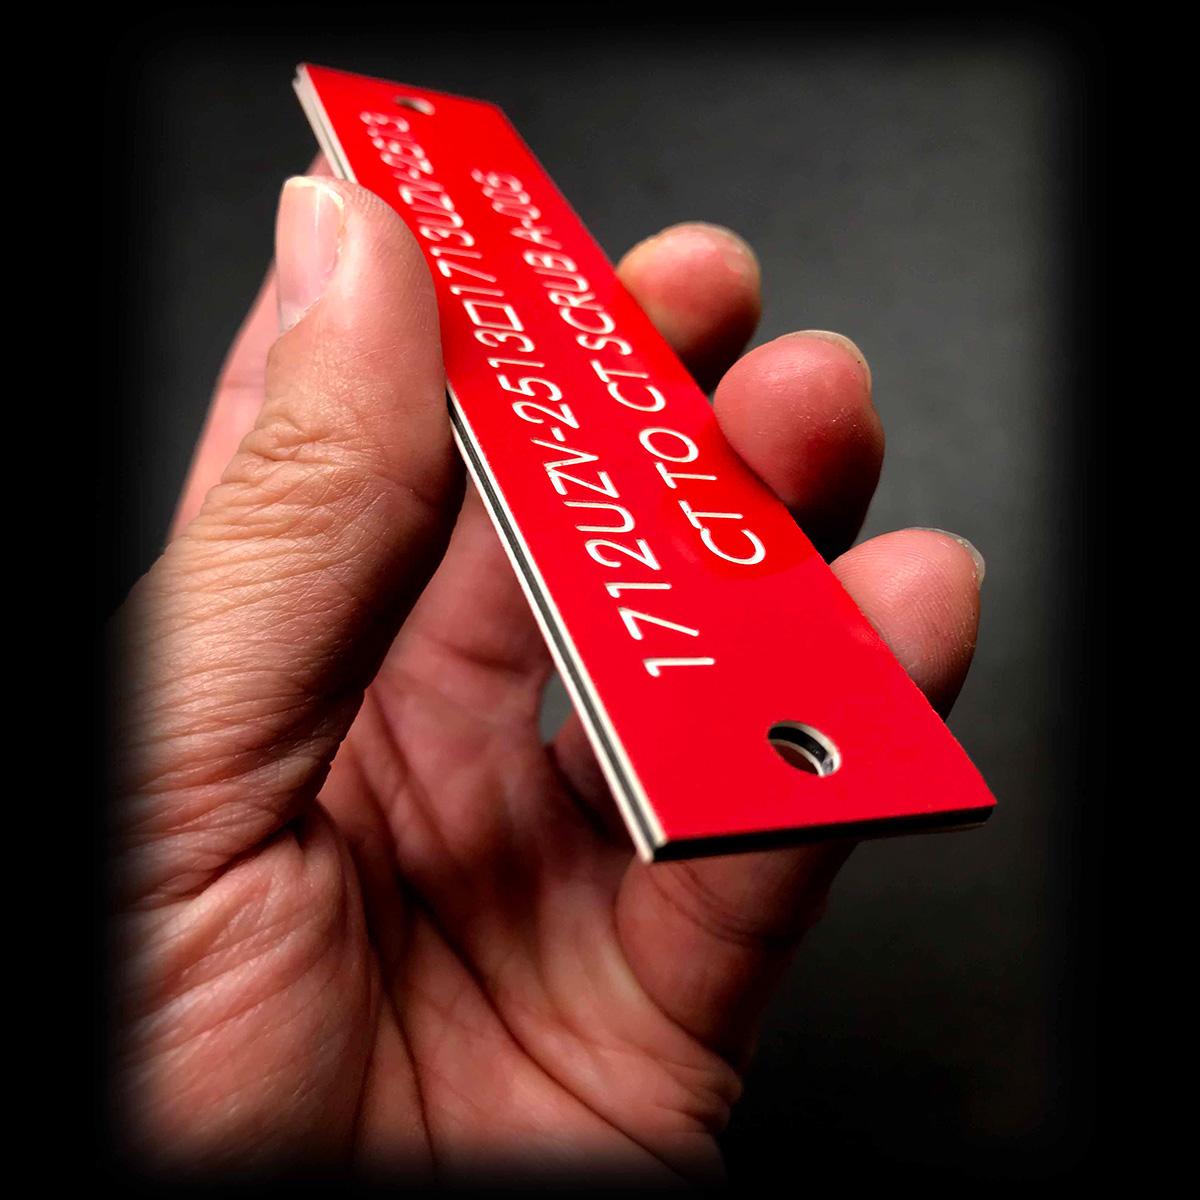 3mm red traffolyte engraving